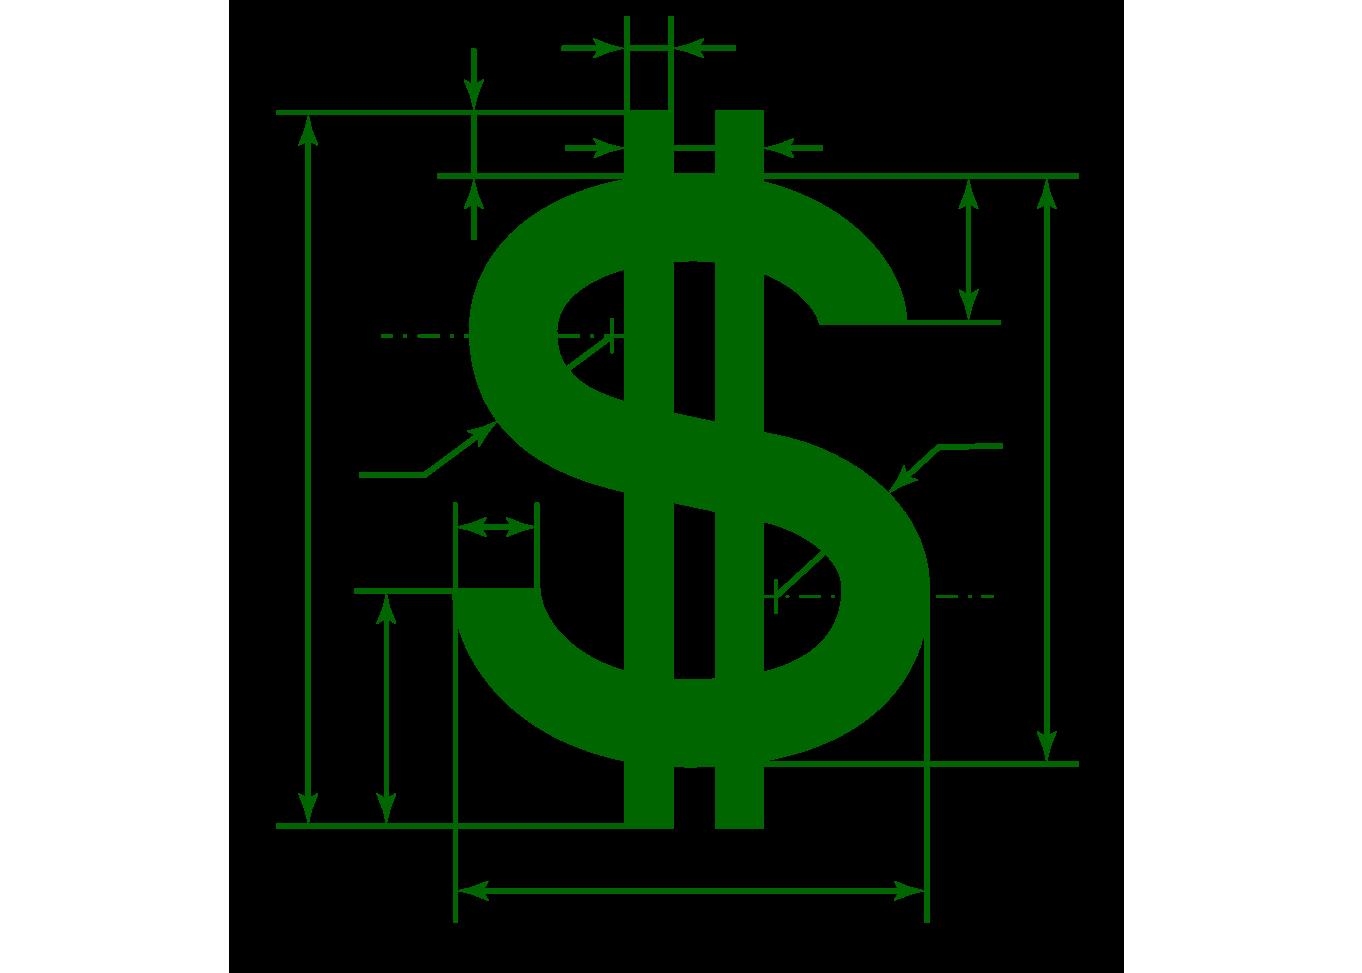 U.S. Dollar sign 1362x973